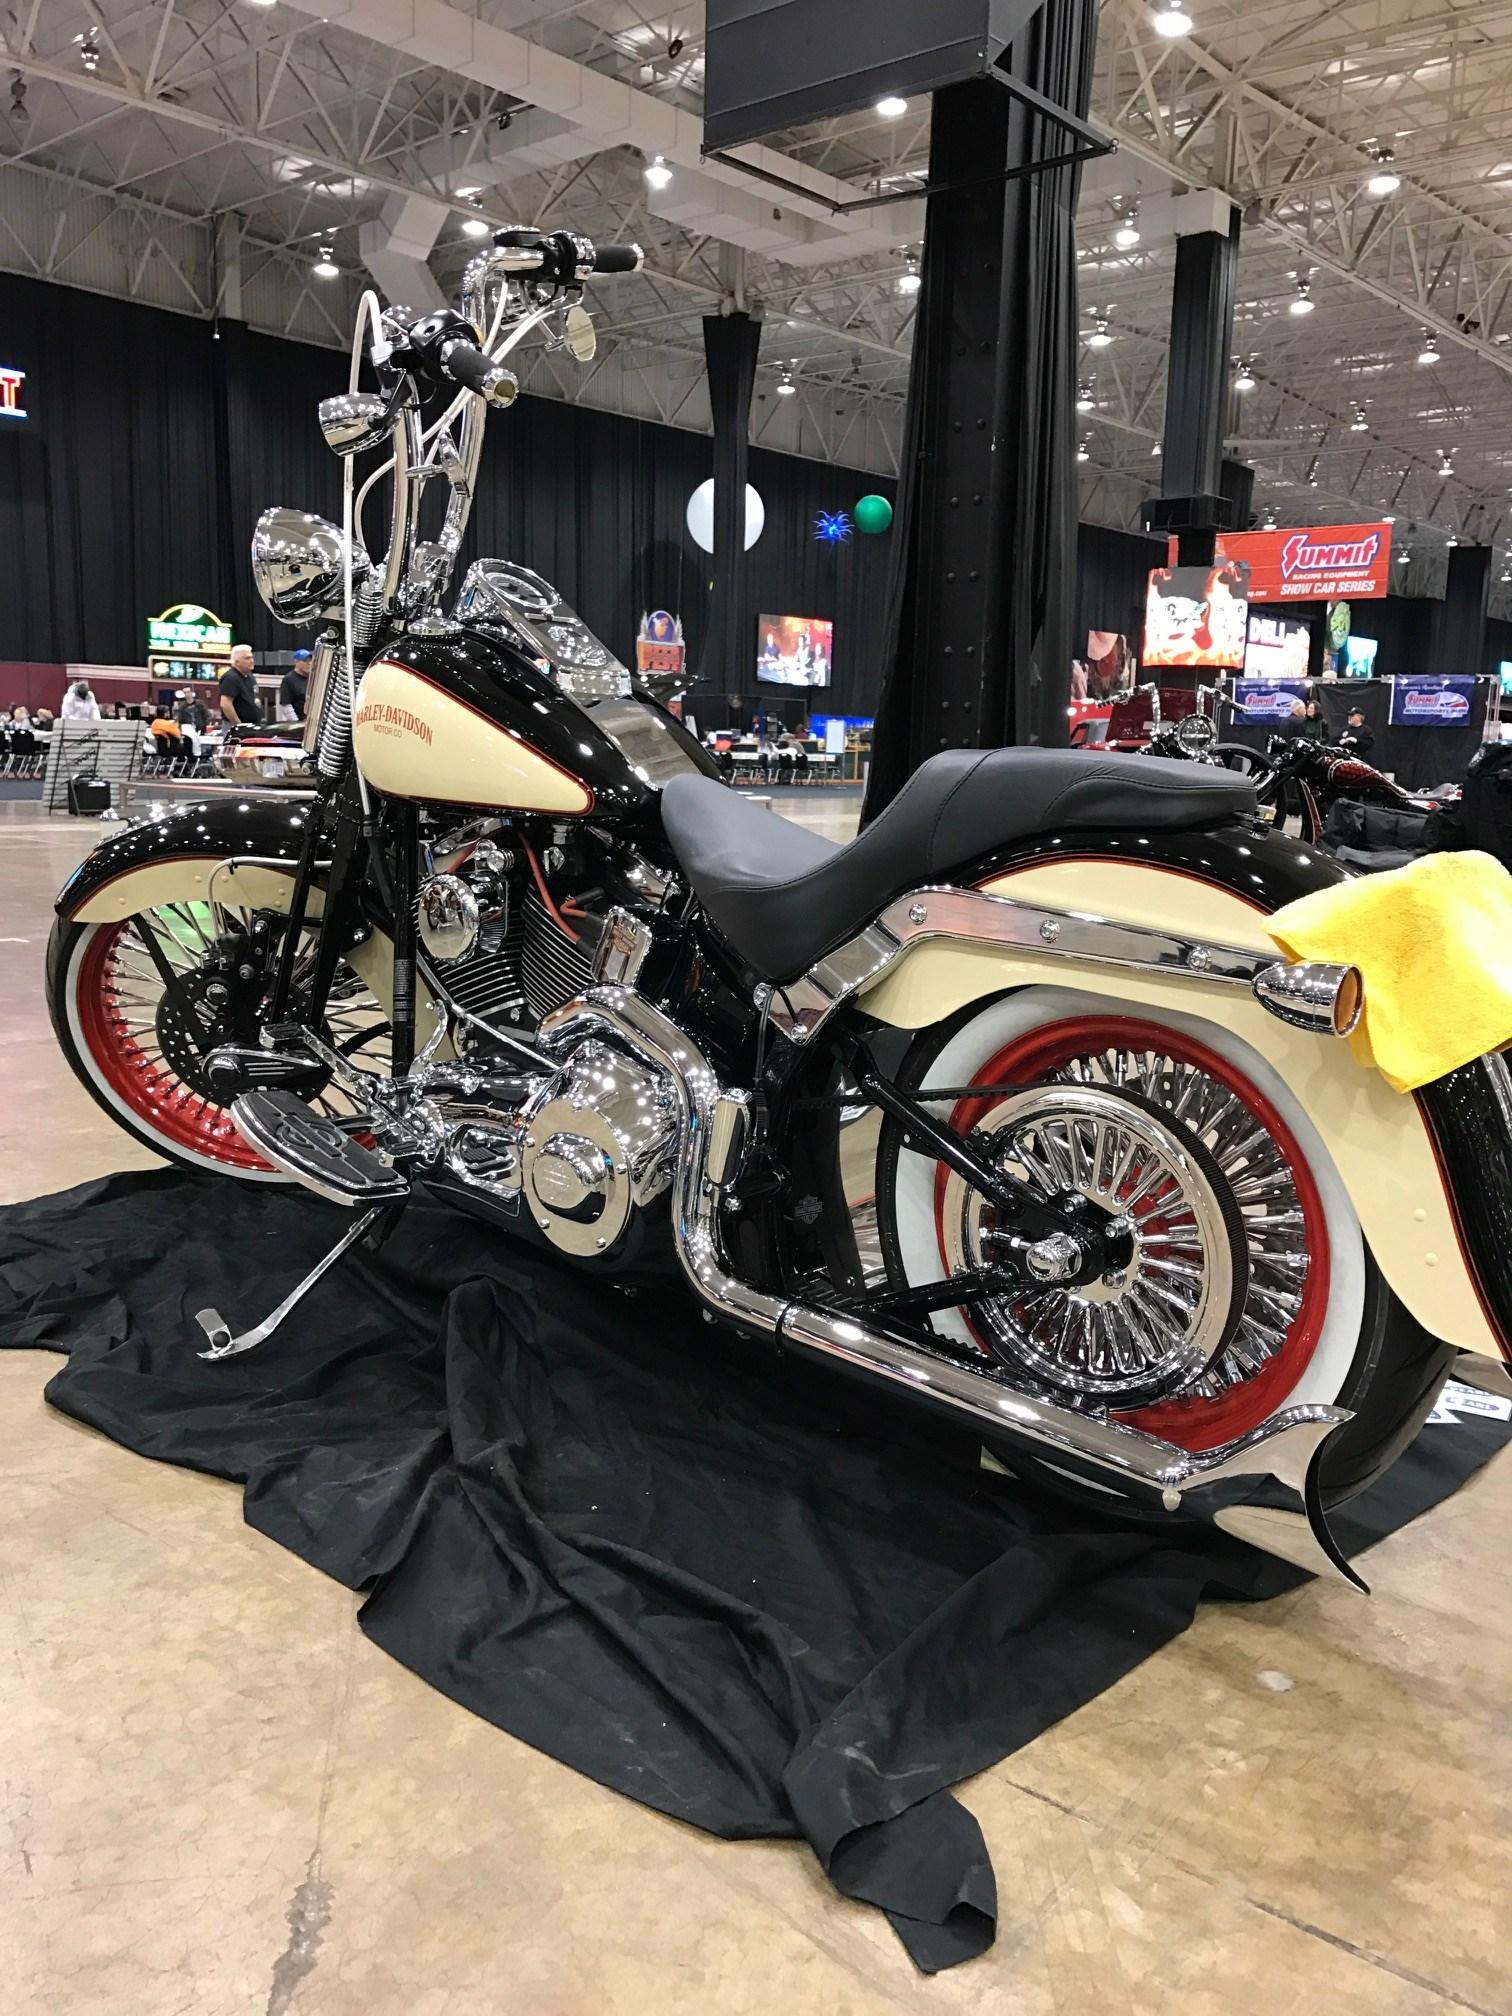 2005 Harley Davidson 174 Flstsc I Softail 174 Springer 174 Classic